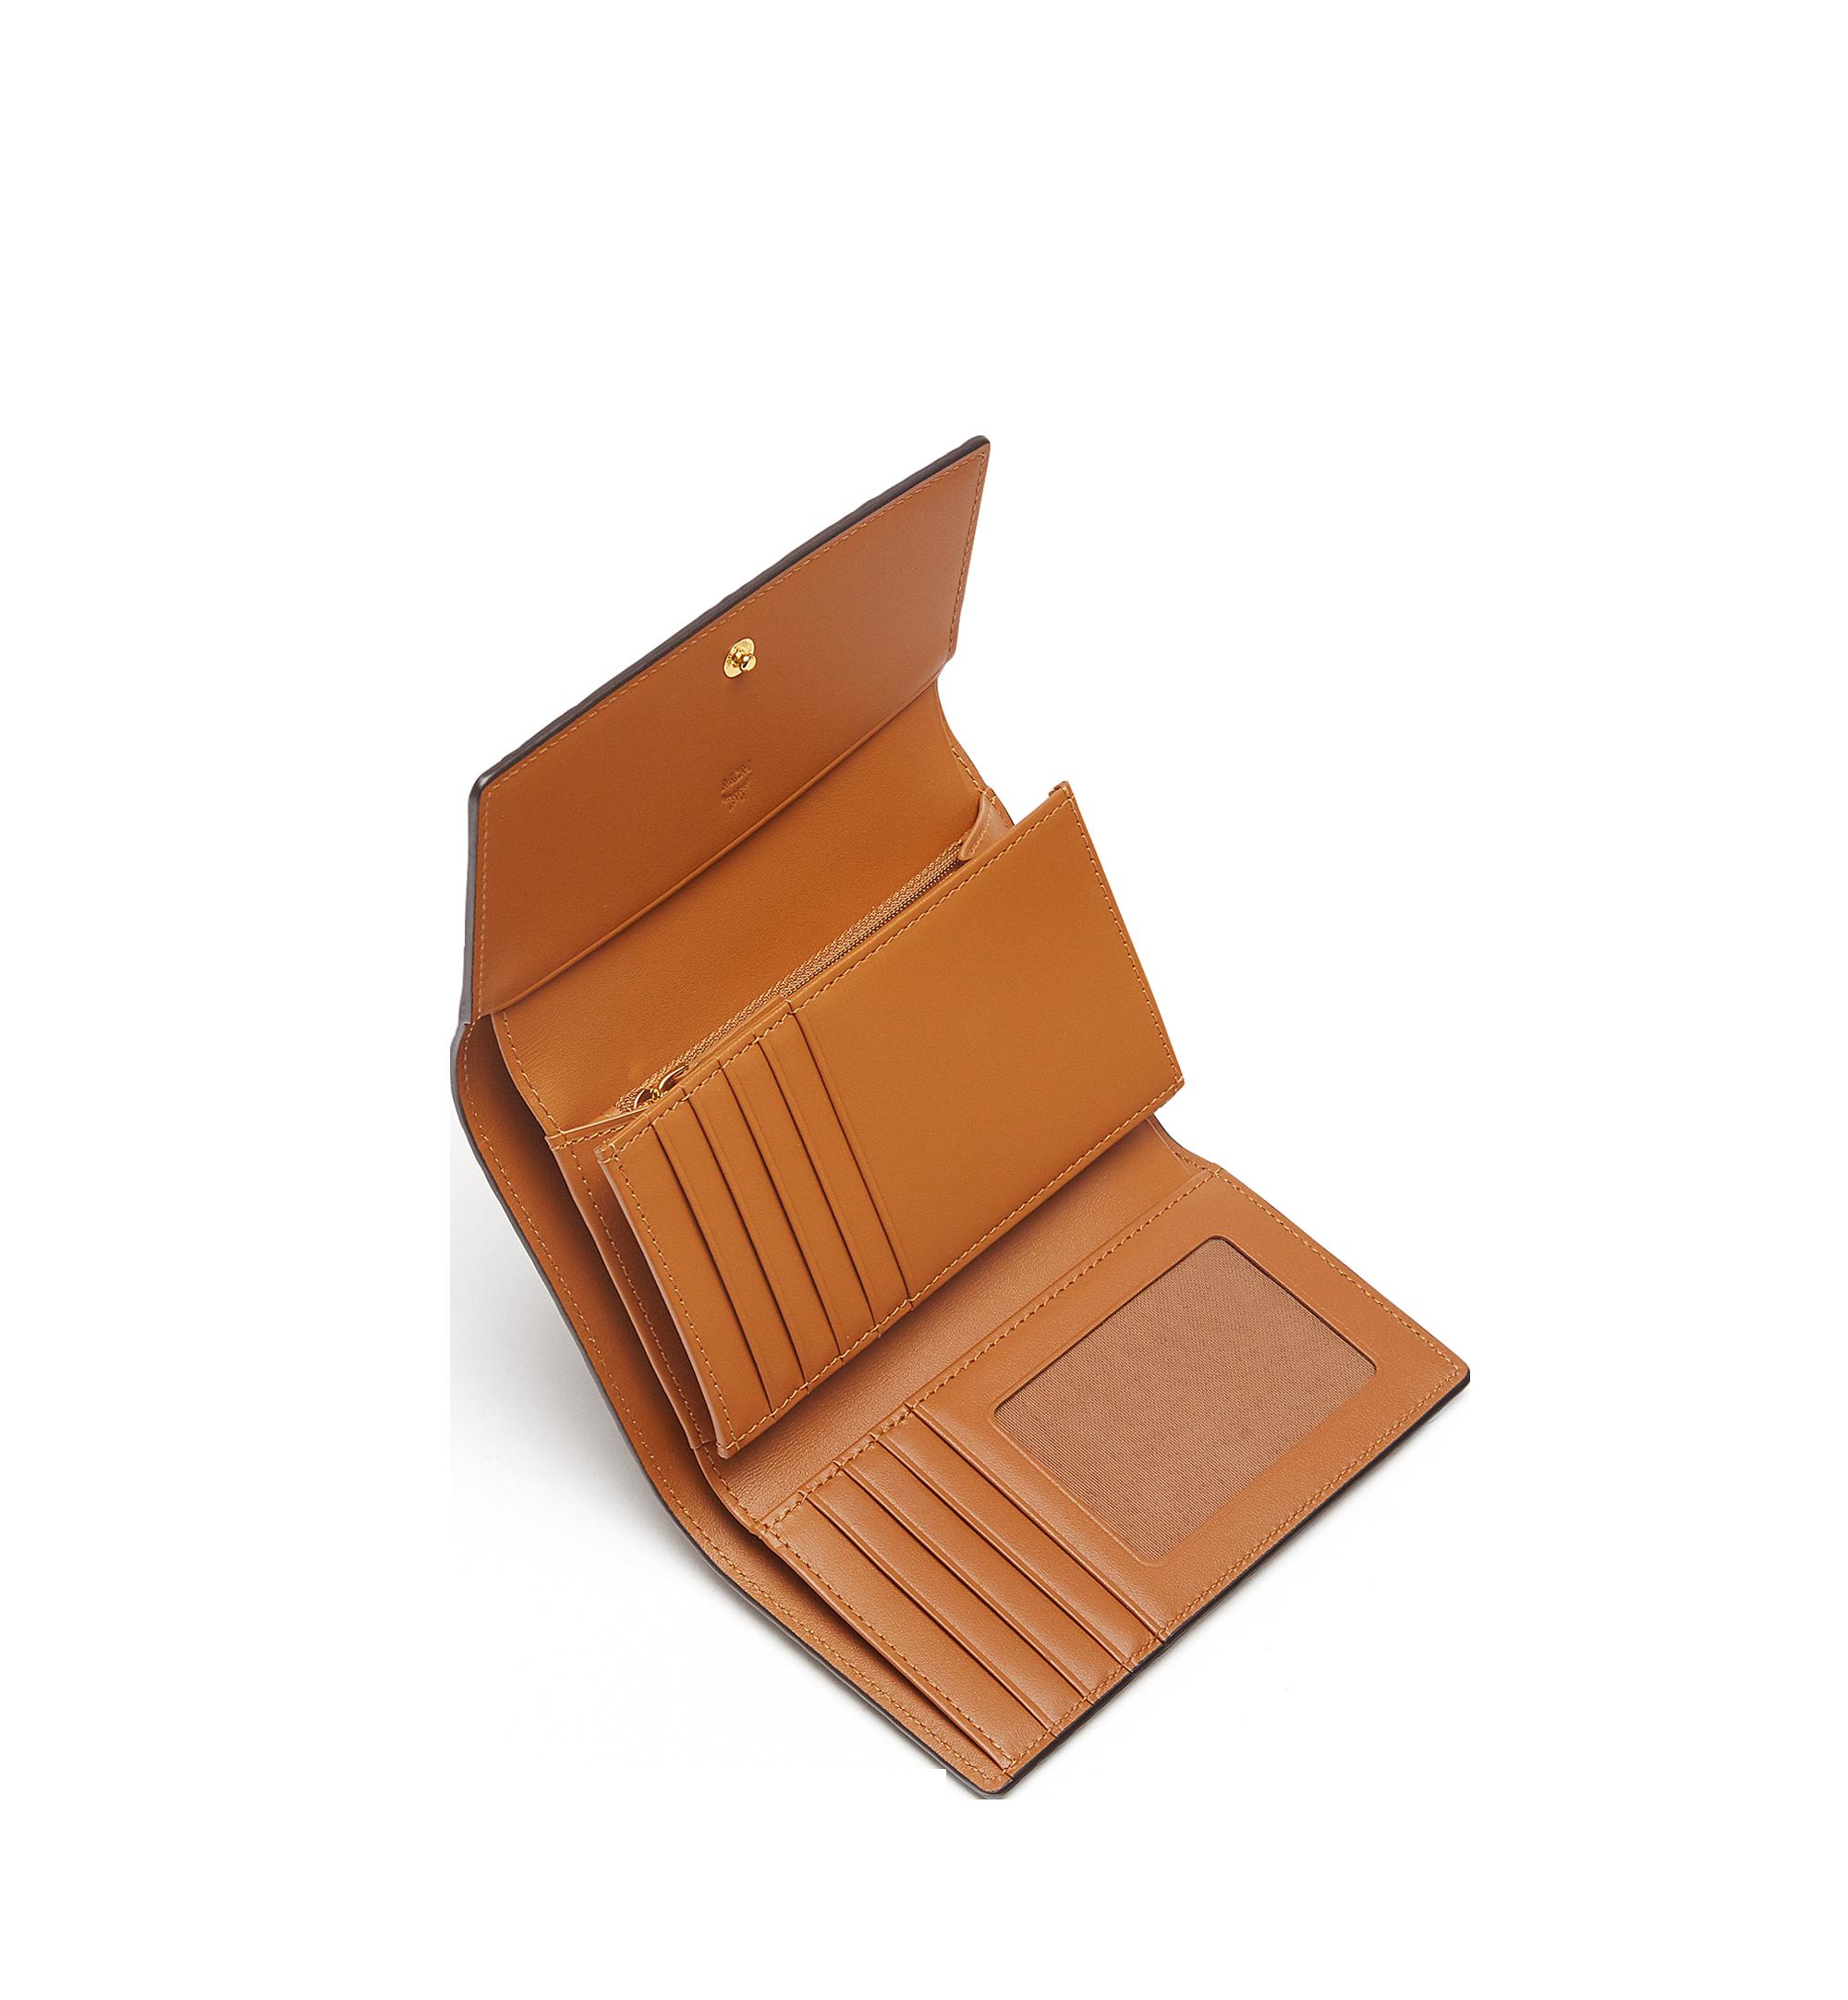 MCM Three Fold Wallet in Visetos Original Cognac MYM8SVI49CO001 更多视角 3